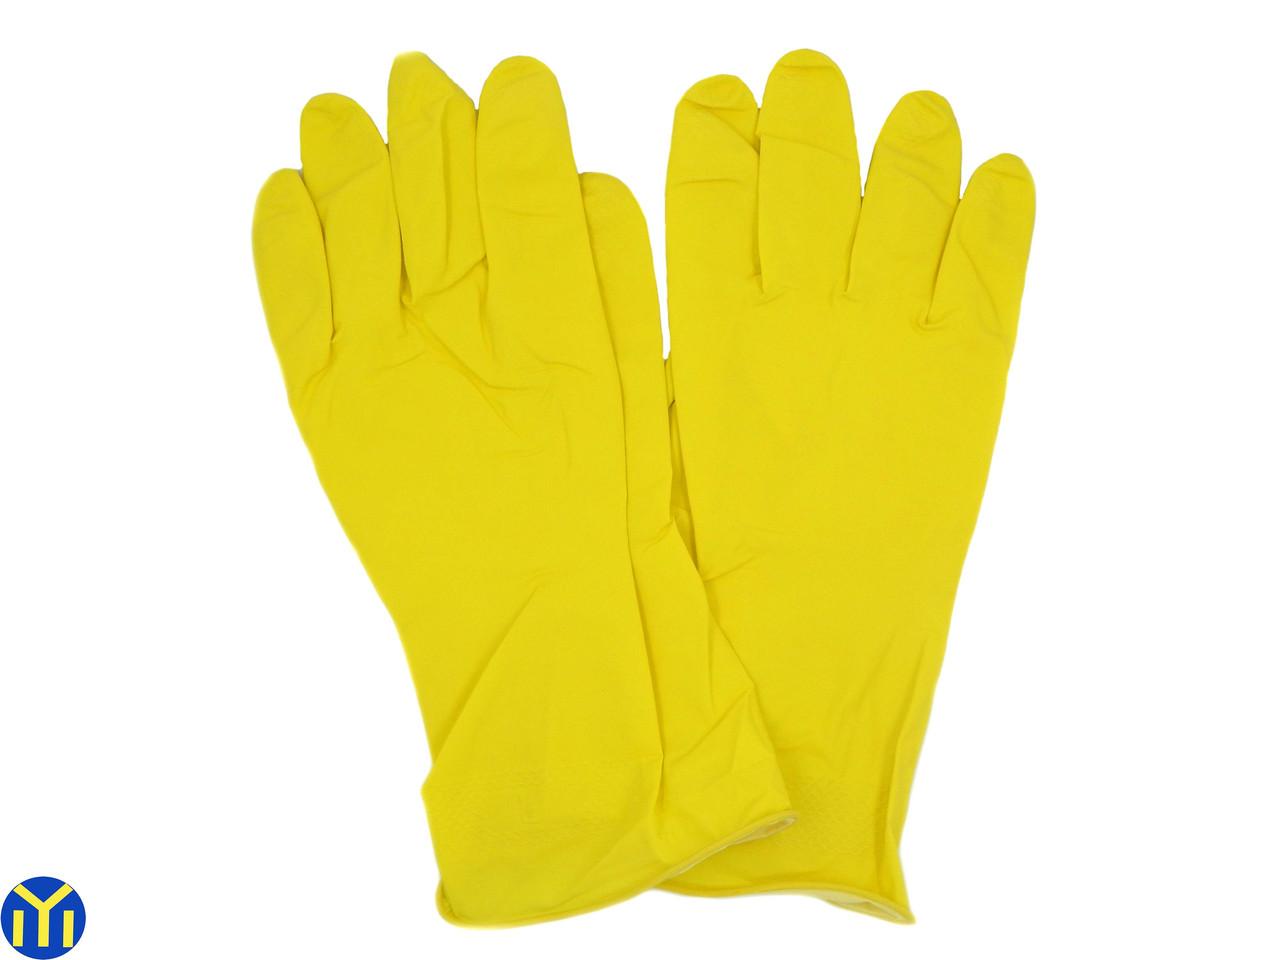 Перчатки хозяйственные резиновые латексные Household Gloves 1уп. 12 пар